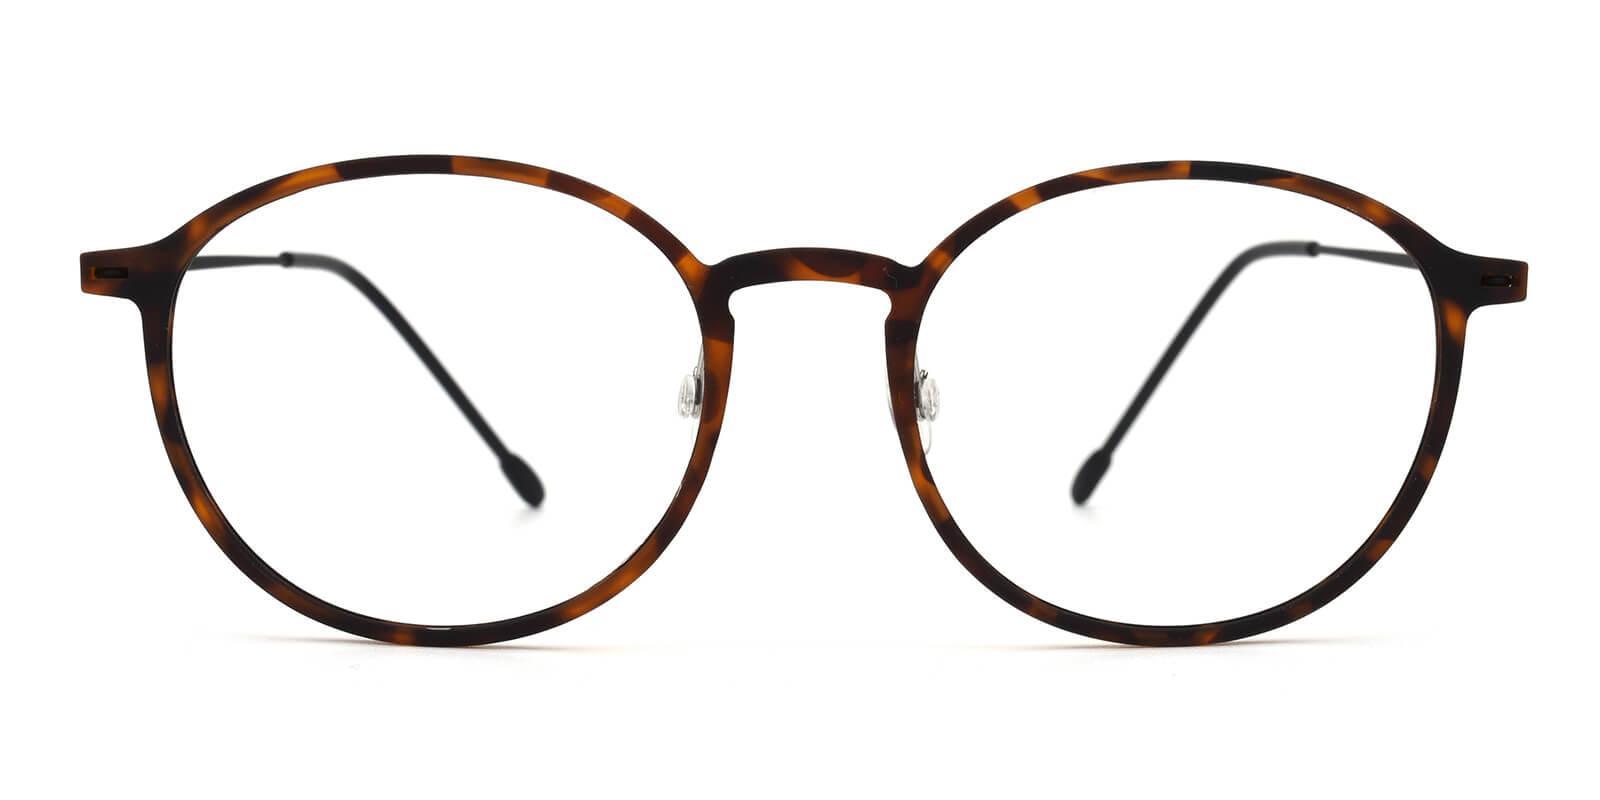 Yunda-Tortoise-Round-Combination-Eyeglasses-detail